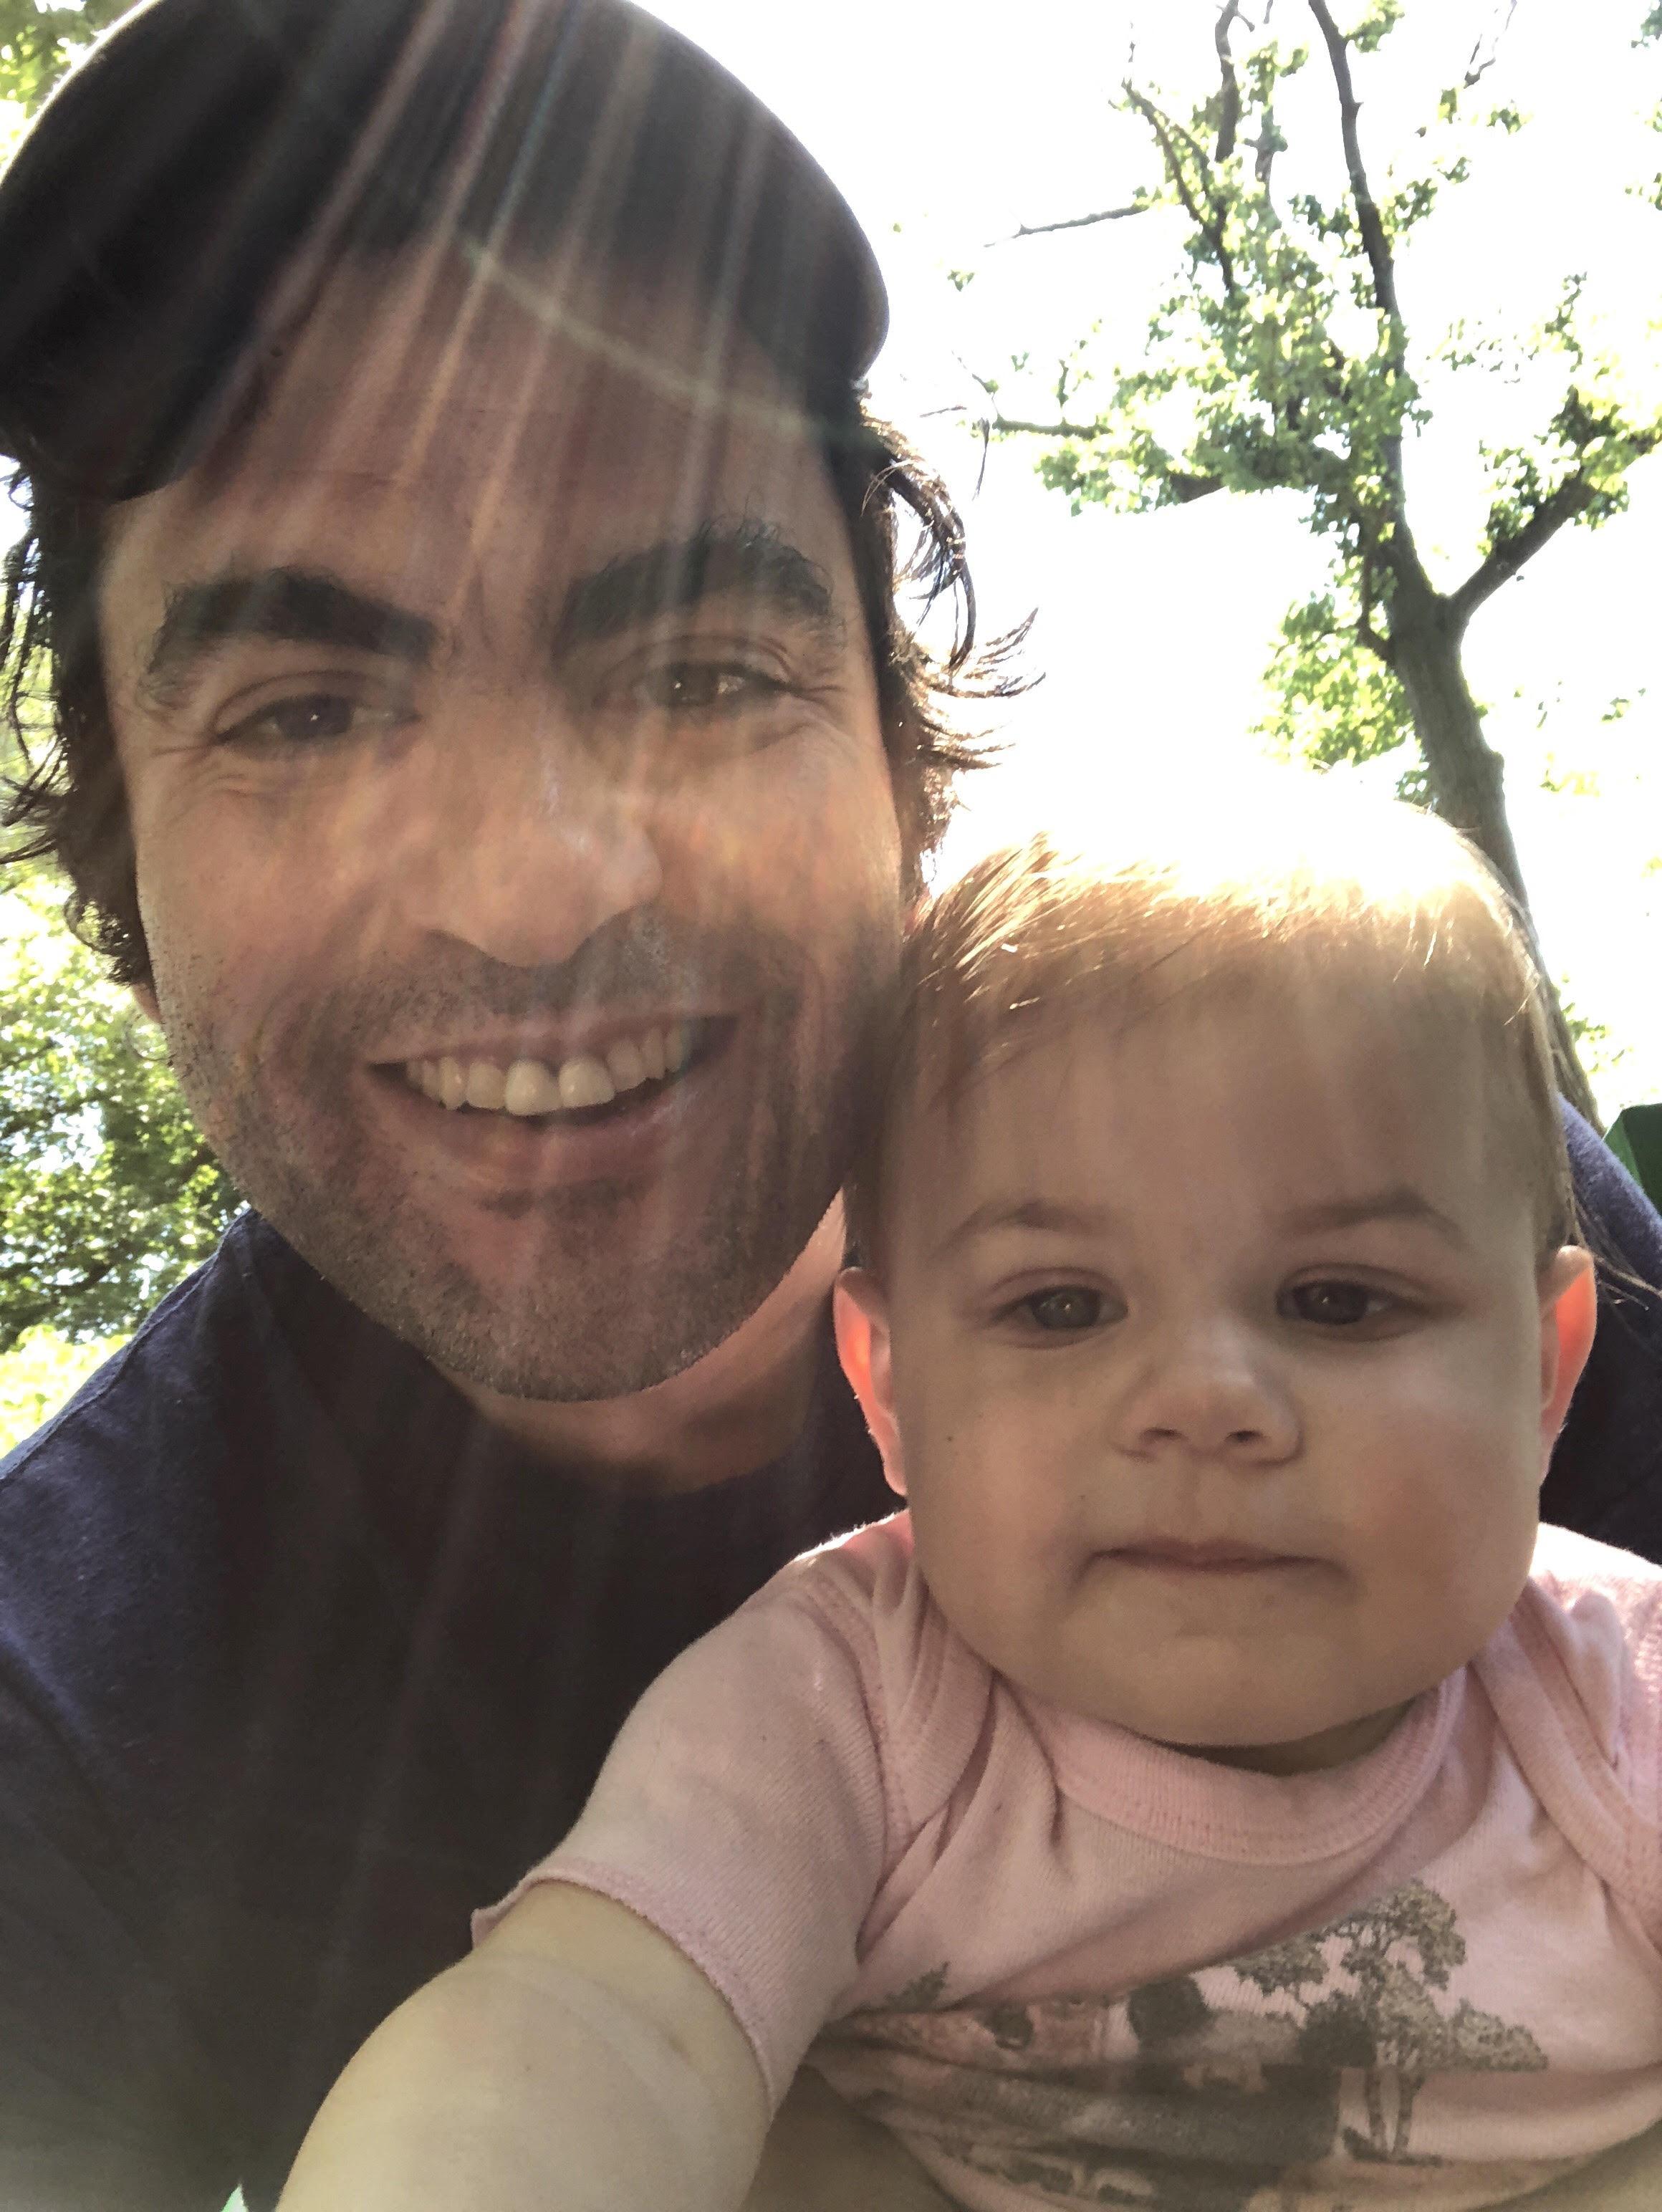 Adam Peltzman and Daughter